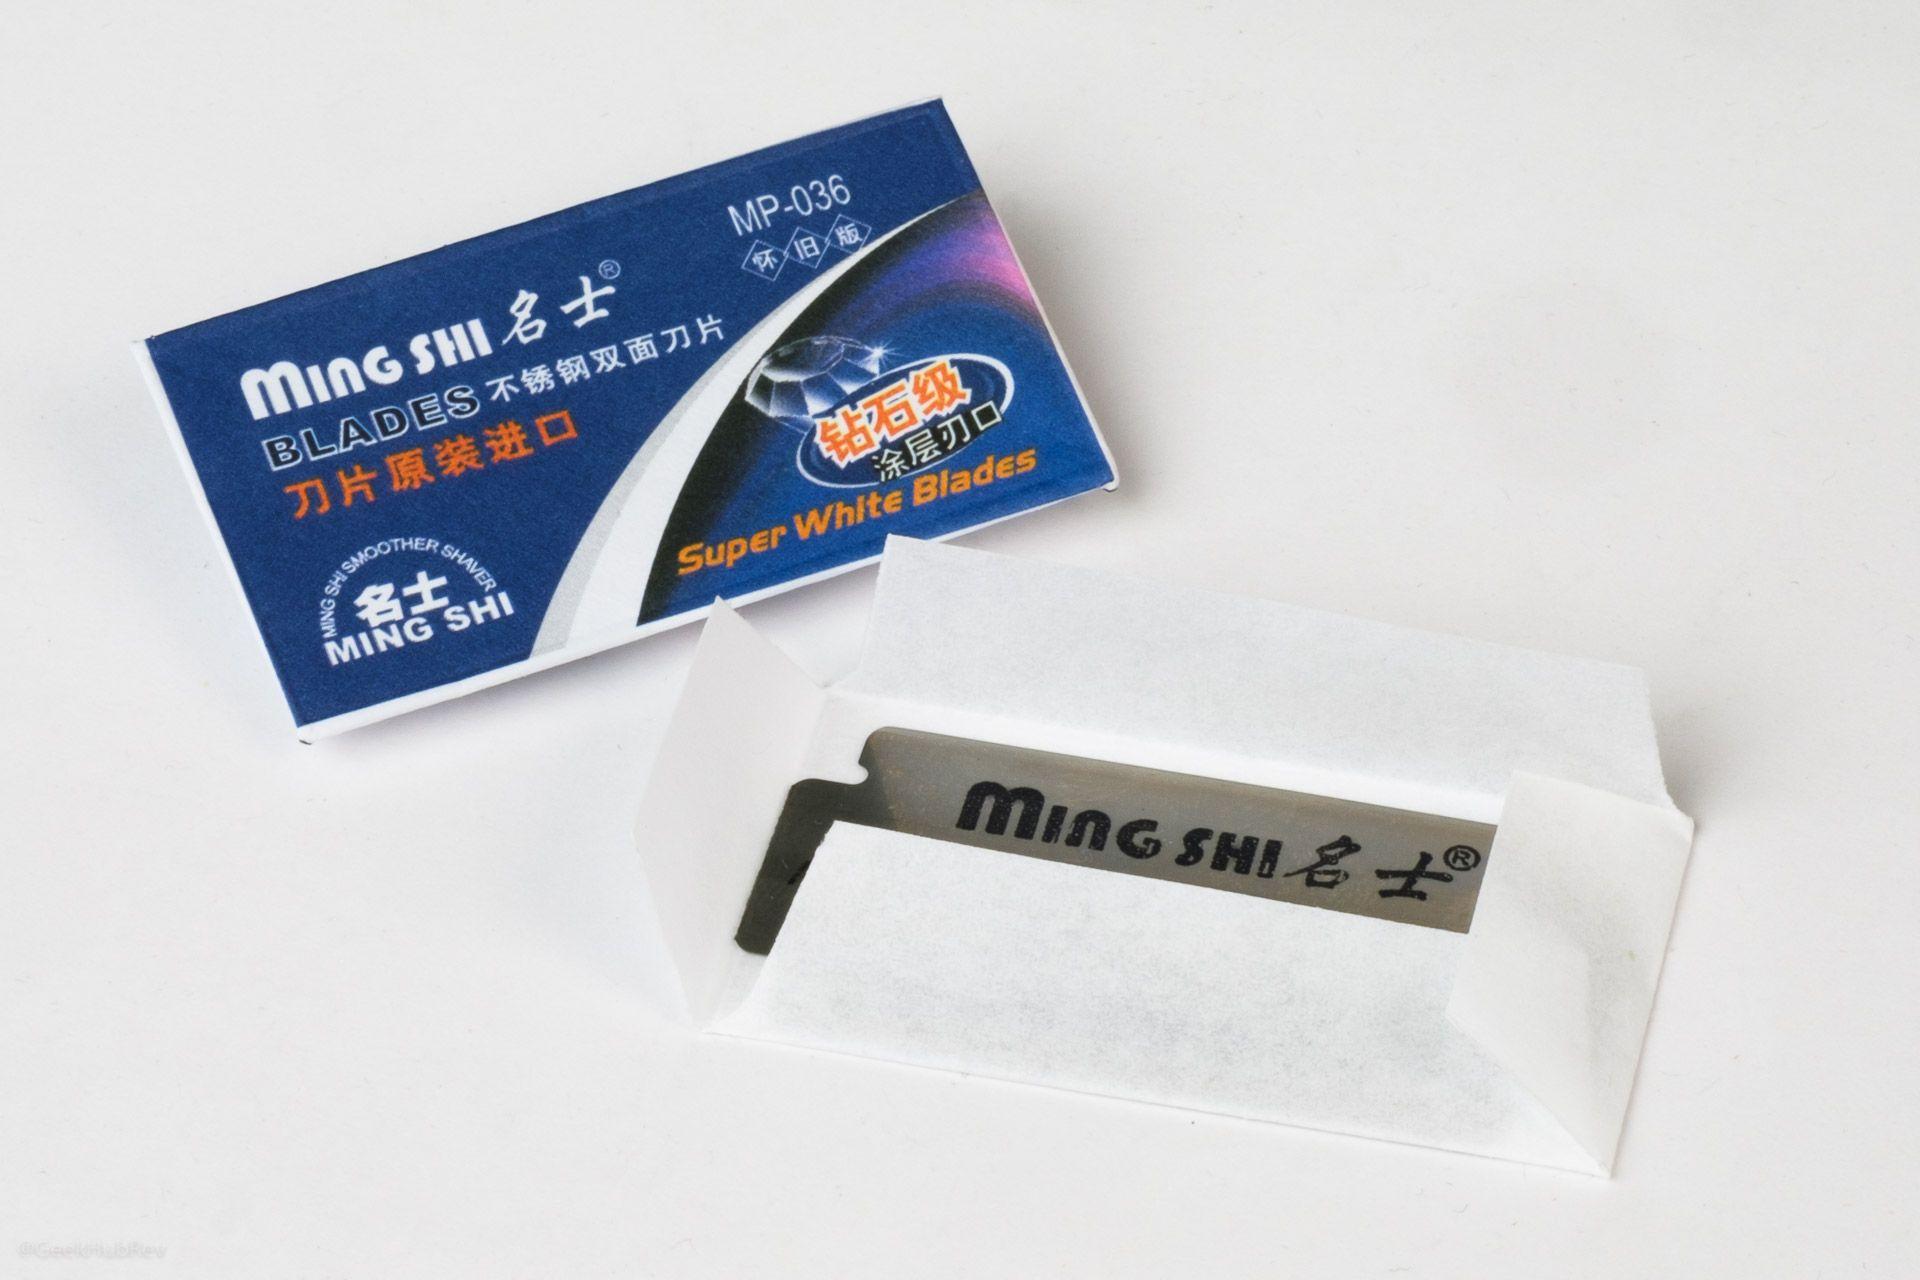 Ming-Shi-Razor-Blades-MP-036-set1